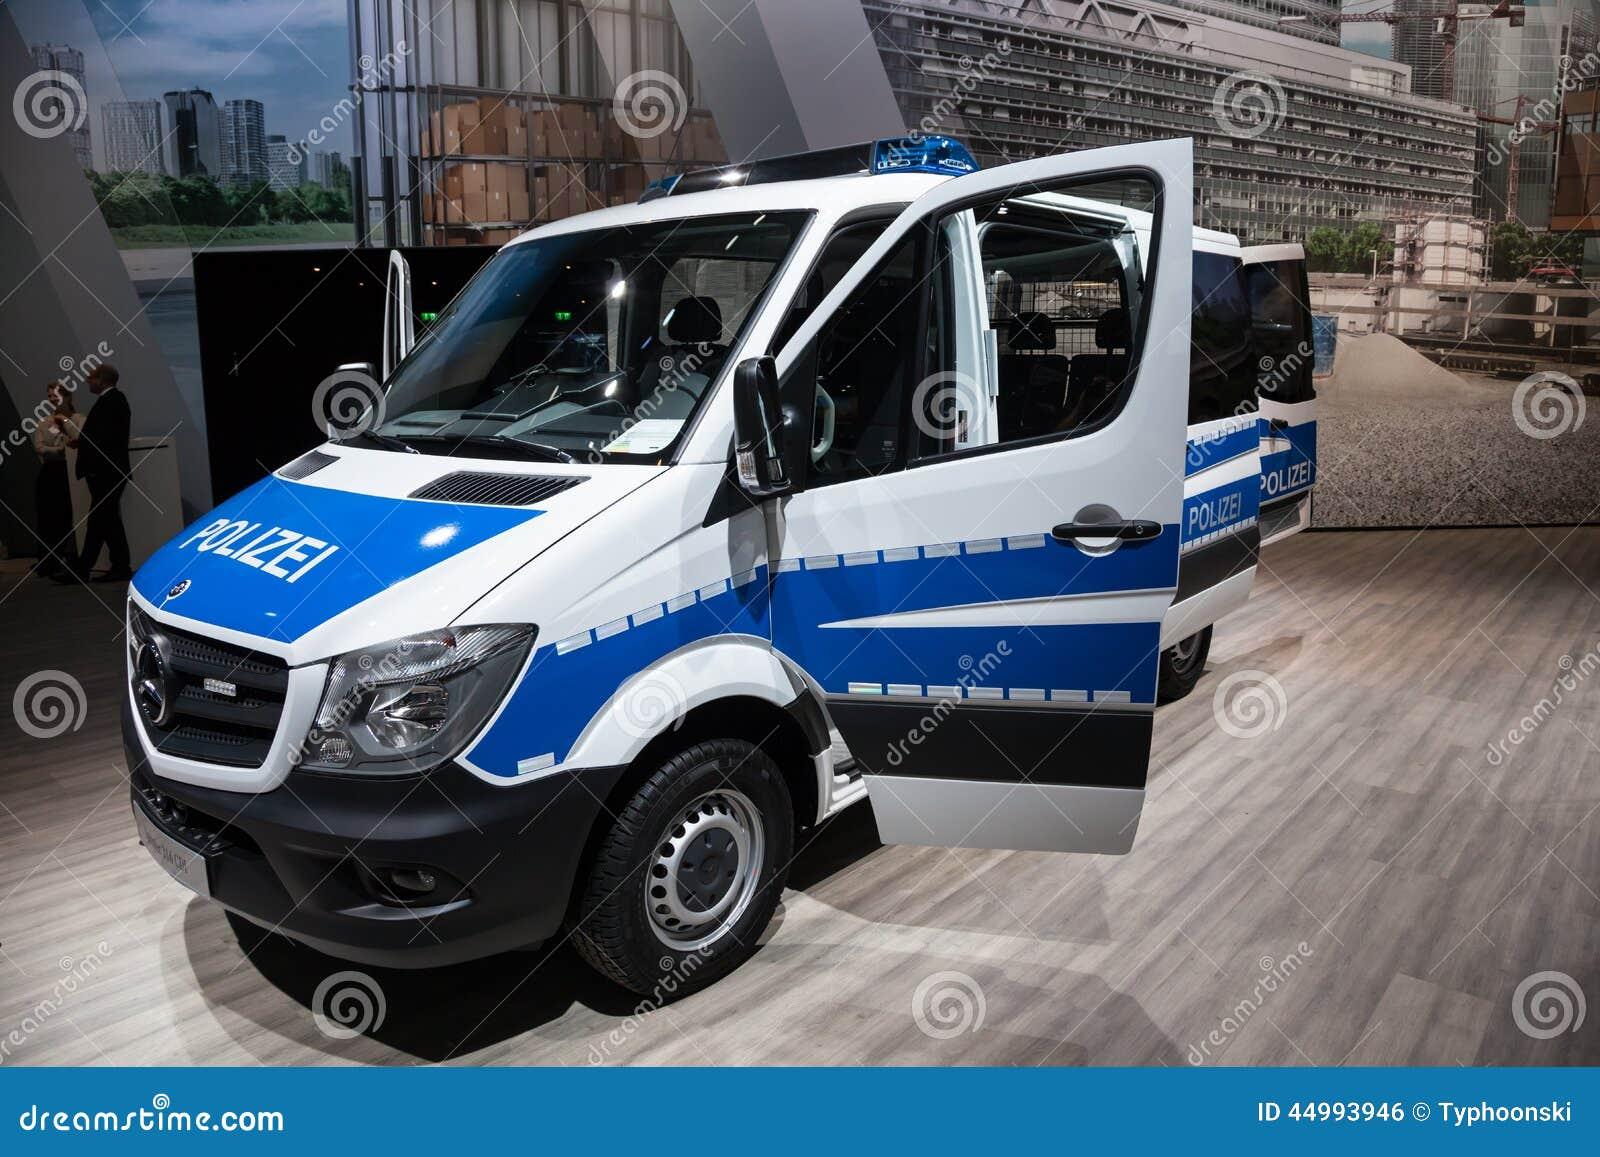 mercedes benz sprinter 316 cdi polizei van editorial photo. Black Bedroom Furniture Sets. Home Design Ideas